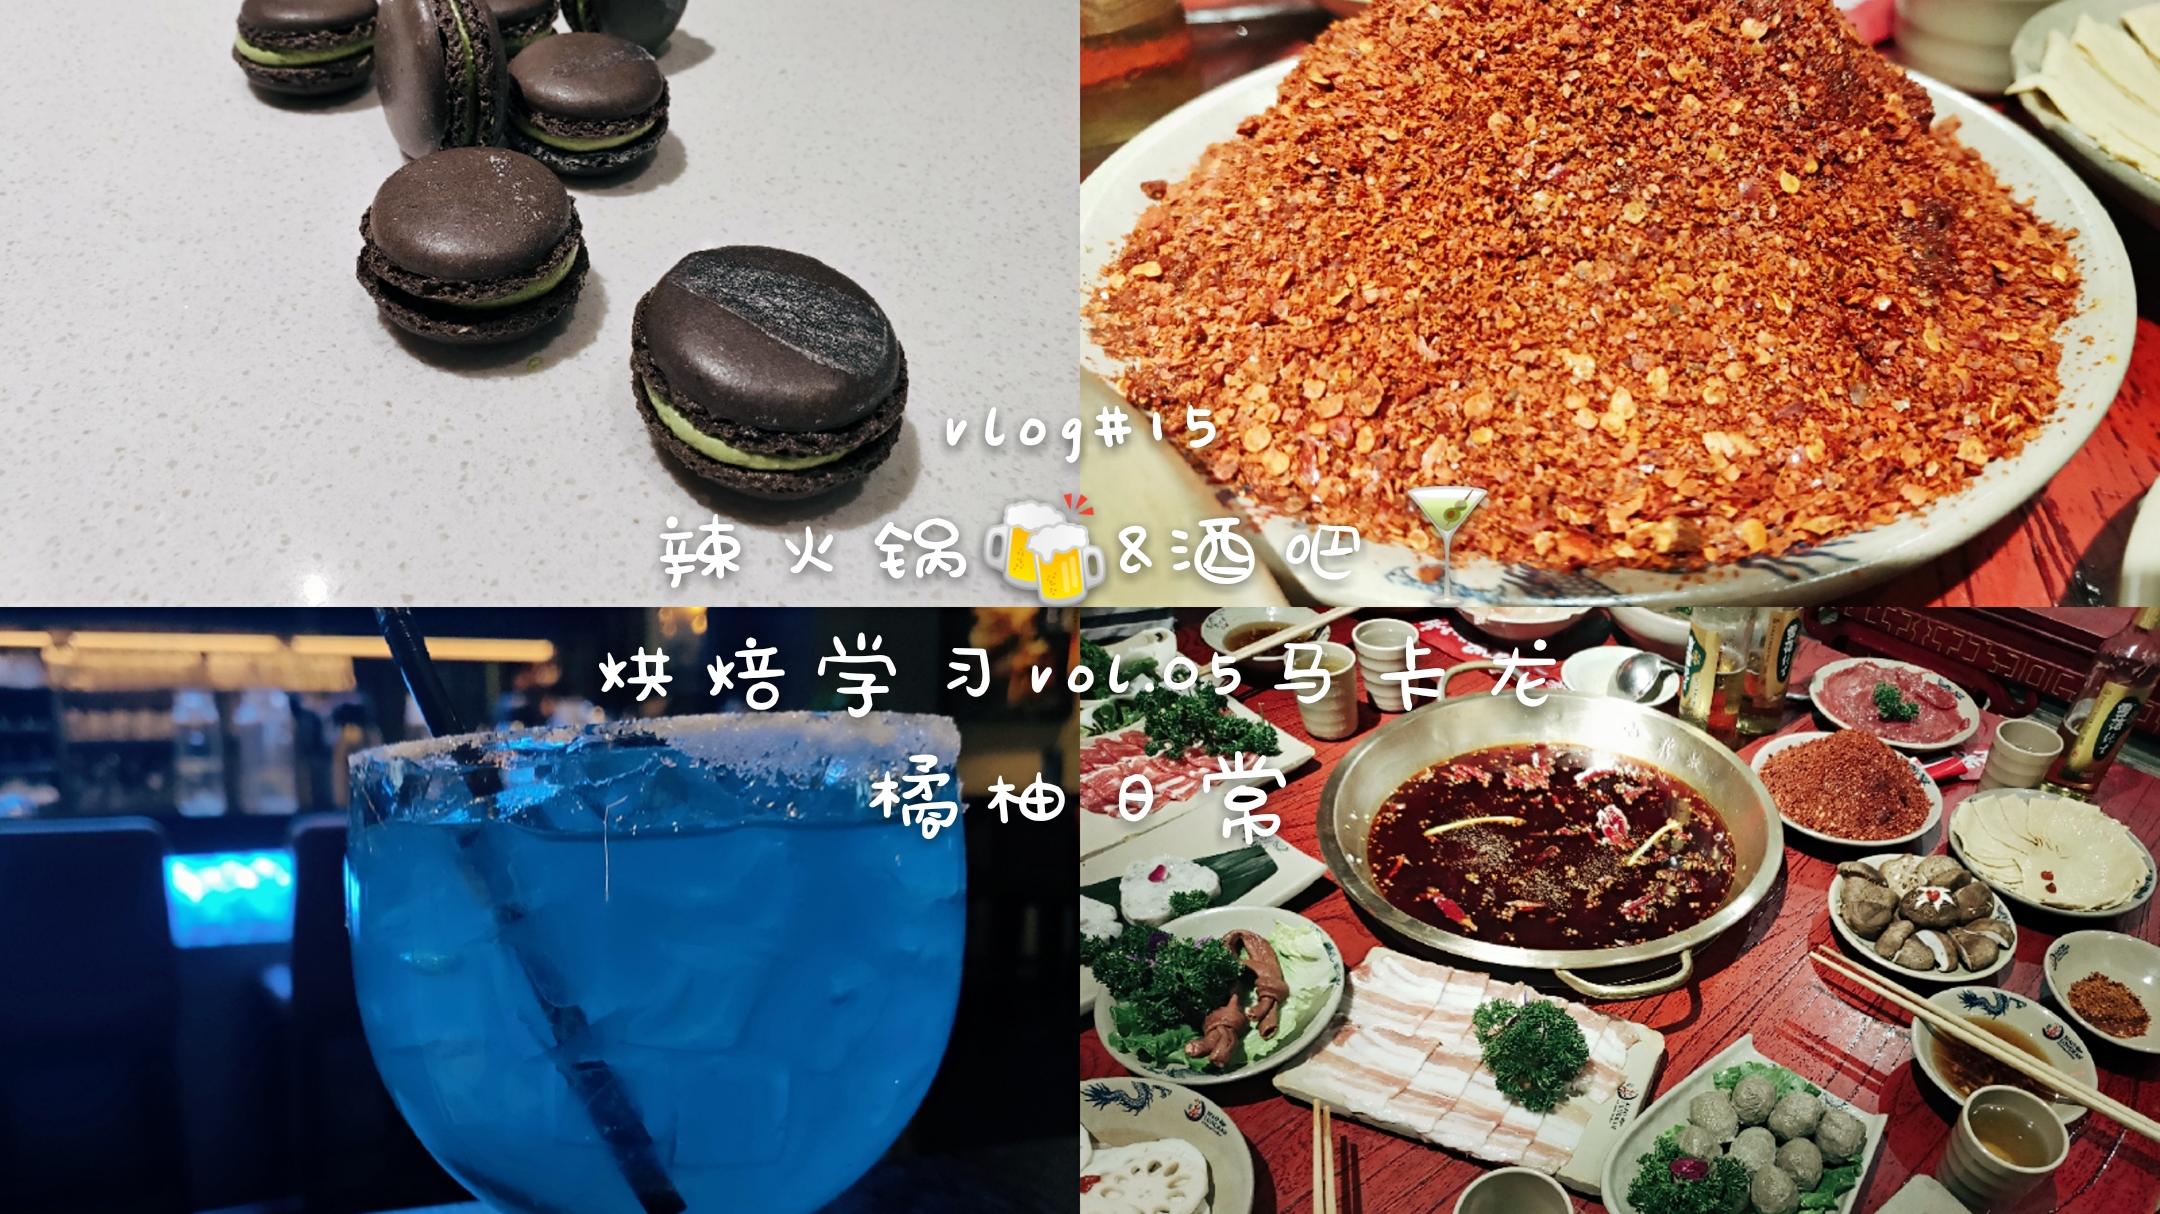 VLOG#15||开心果马卡龙||竹炭马卡龙||小龙坎辣火锅||肠结||莫吉托||玛格丽特